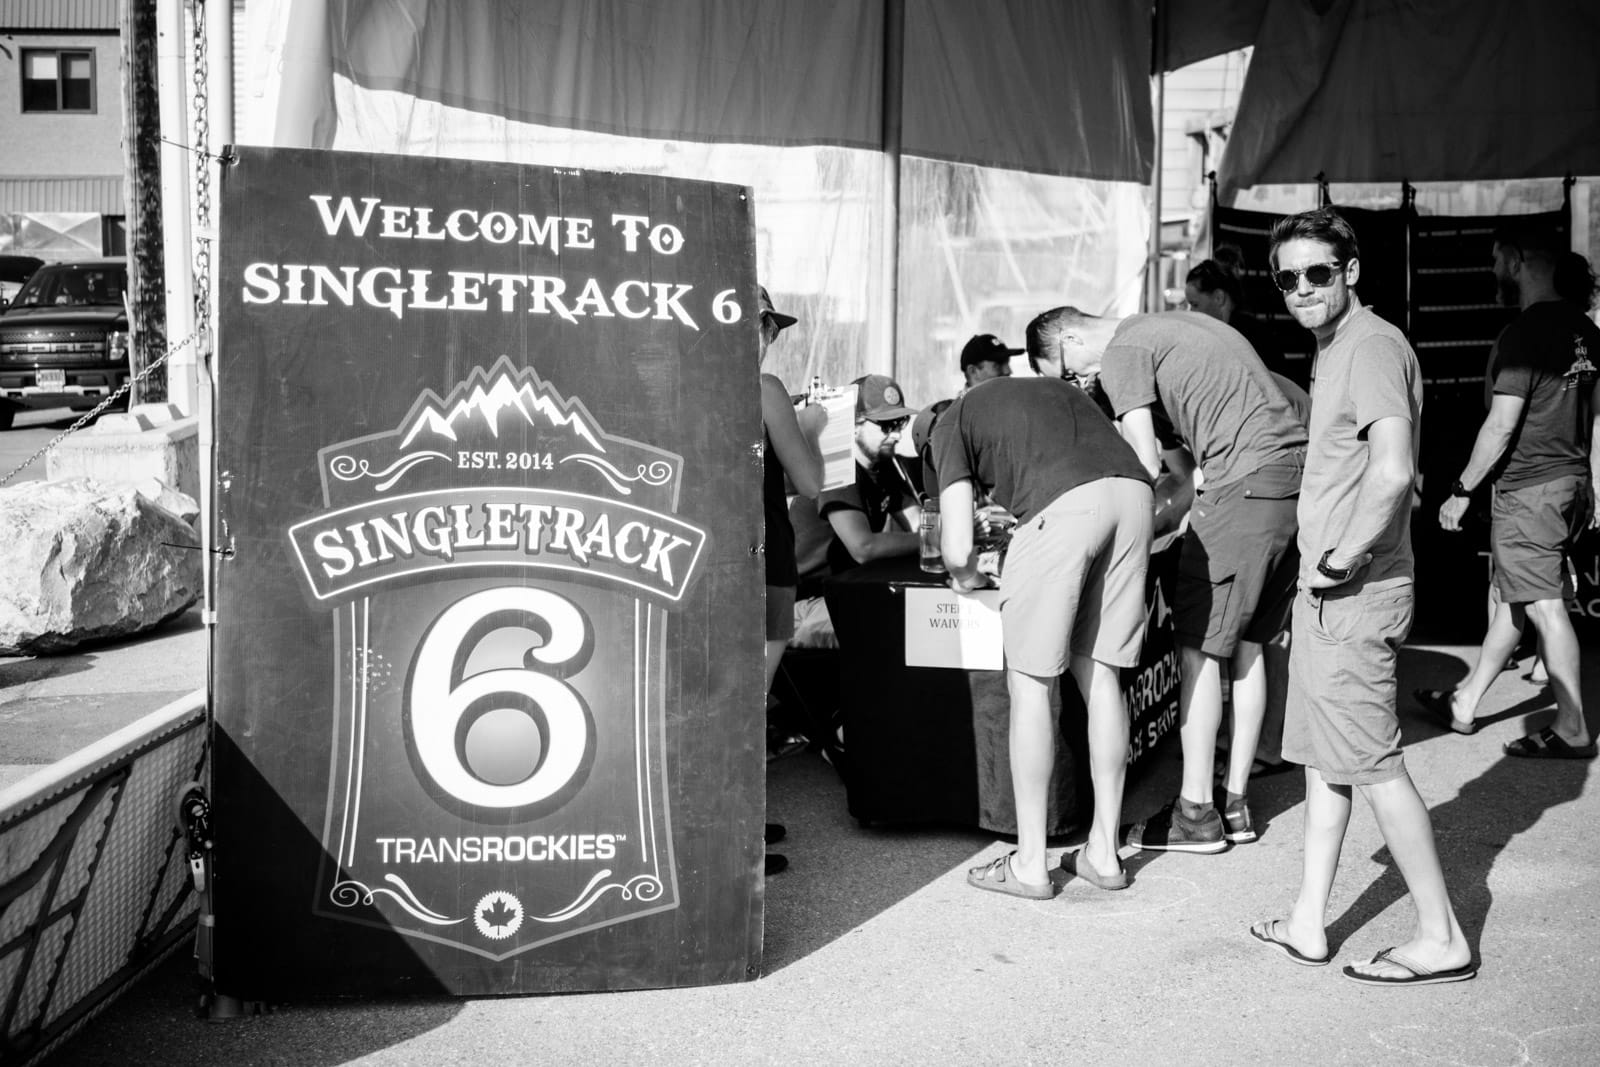 Santa Cruz Bicycles - Signing in Before Singletrack6